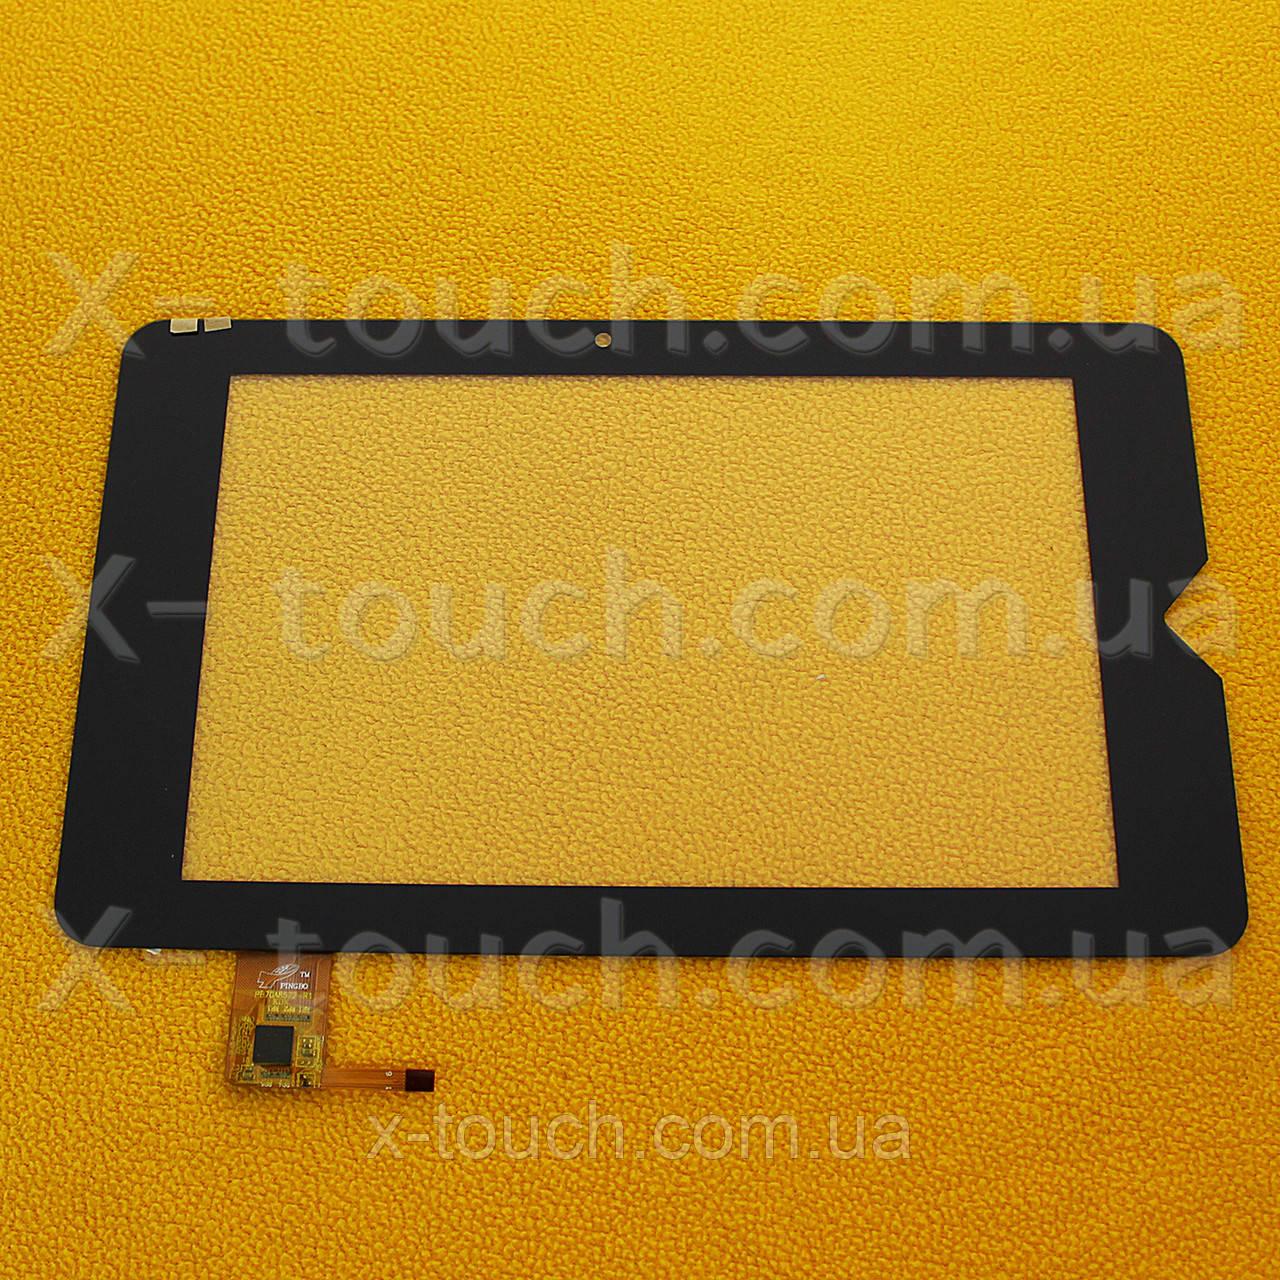 Тачскрин, сенсор  PINGBO PB70A8572-R1 KDX  для планшета